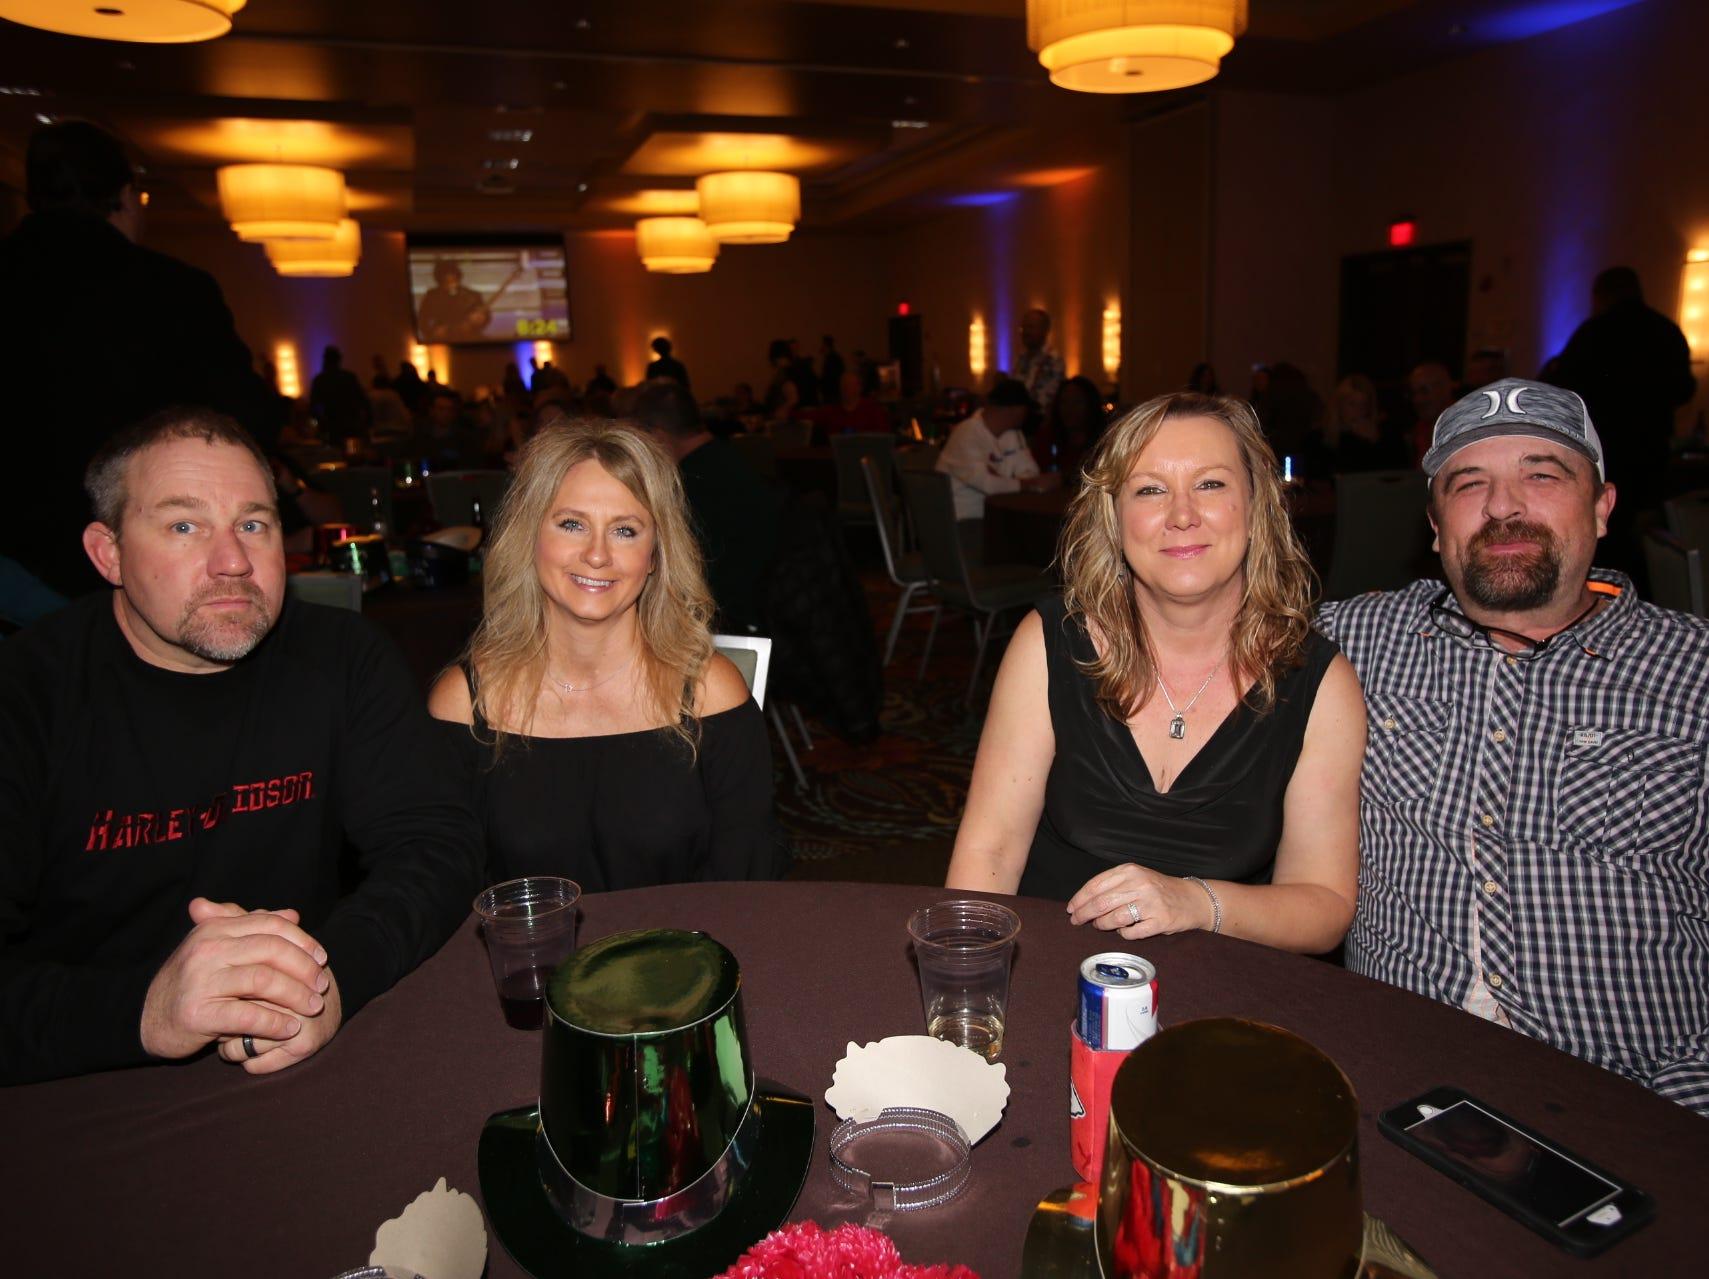 Tod, Sherri, Karin, and Keith